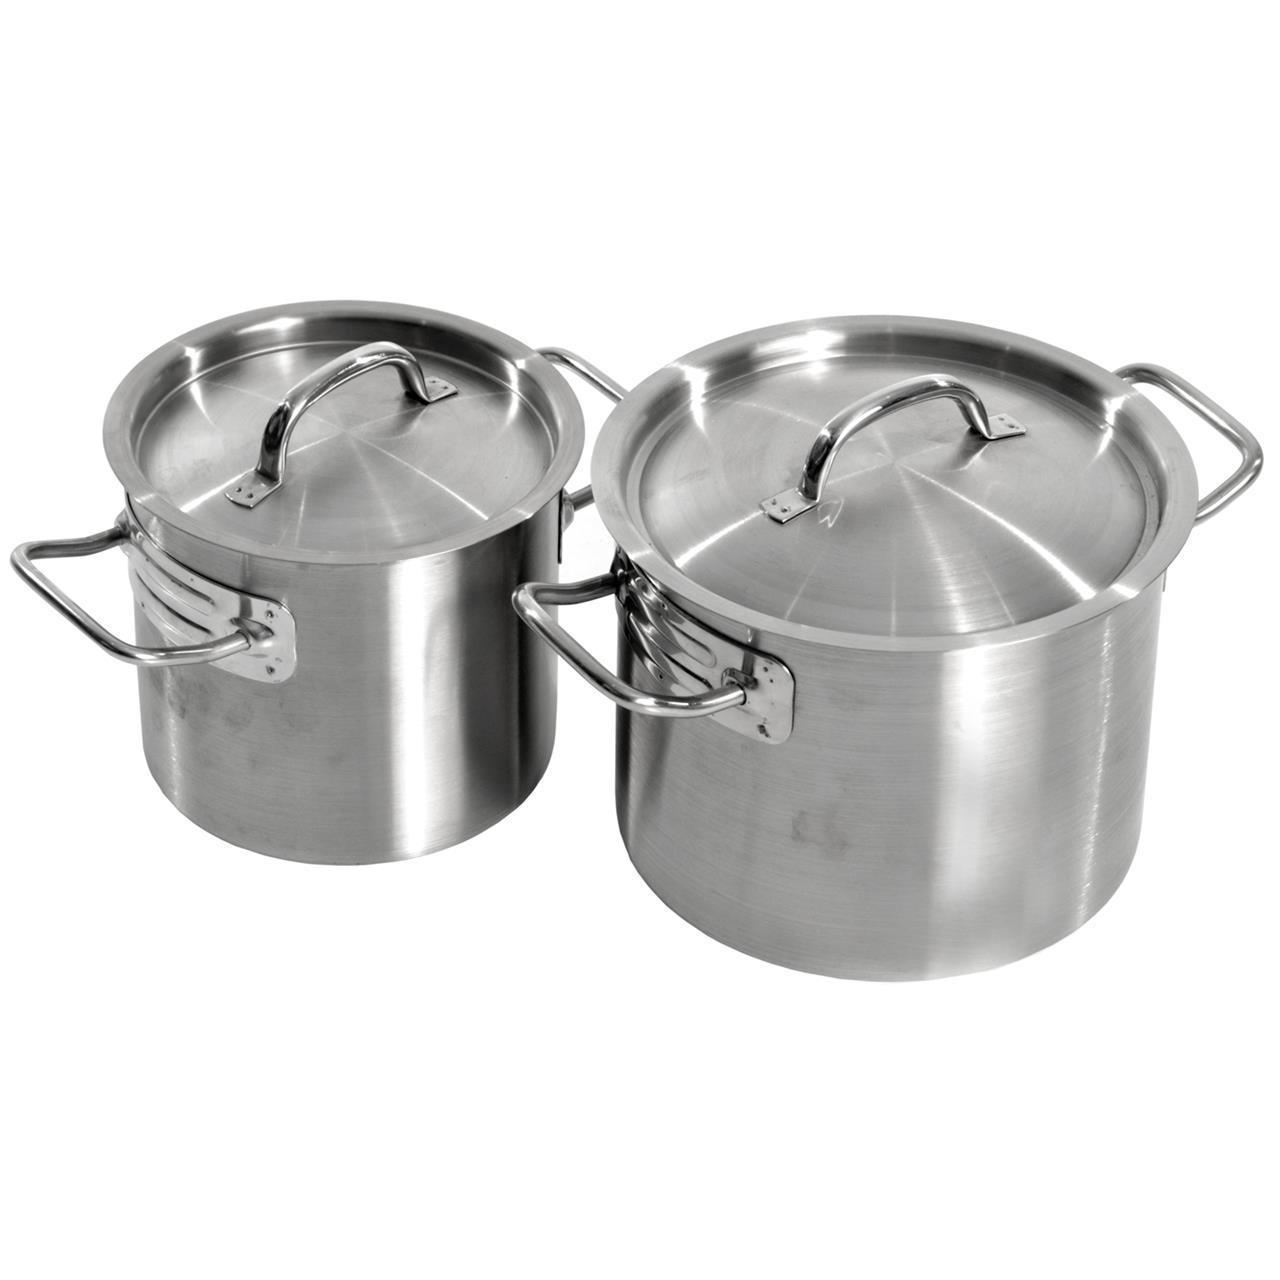 KH Stainless Steel Saucepot